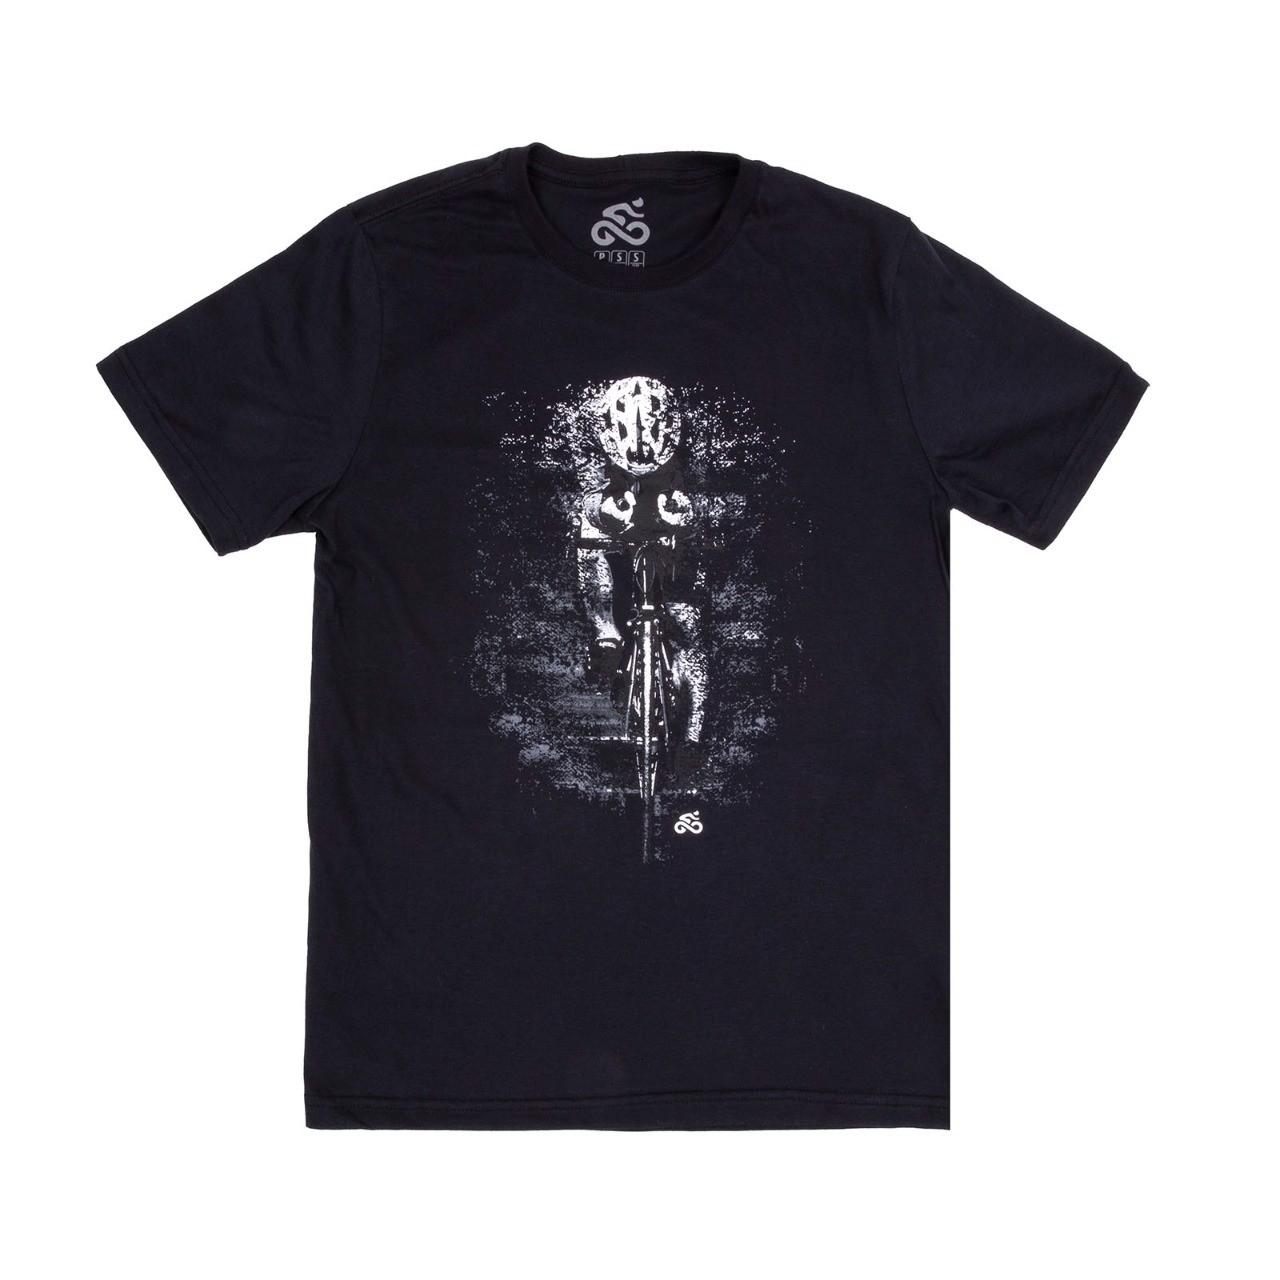 Camiseta Casual Go Bike Contrarrelógio Preta